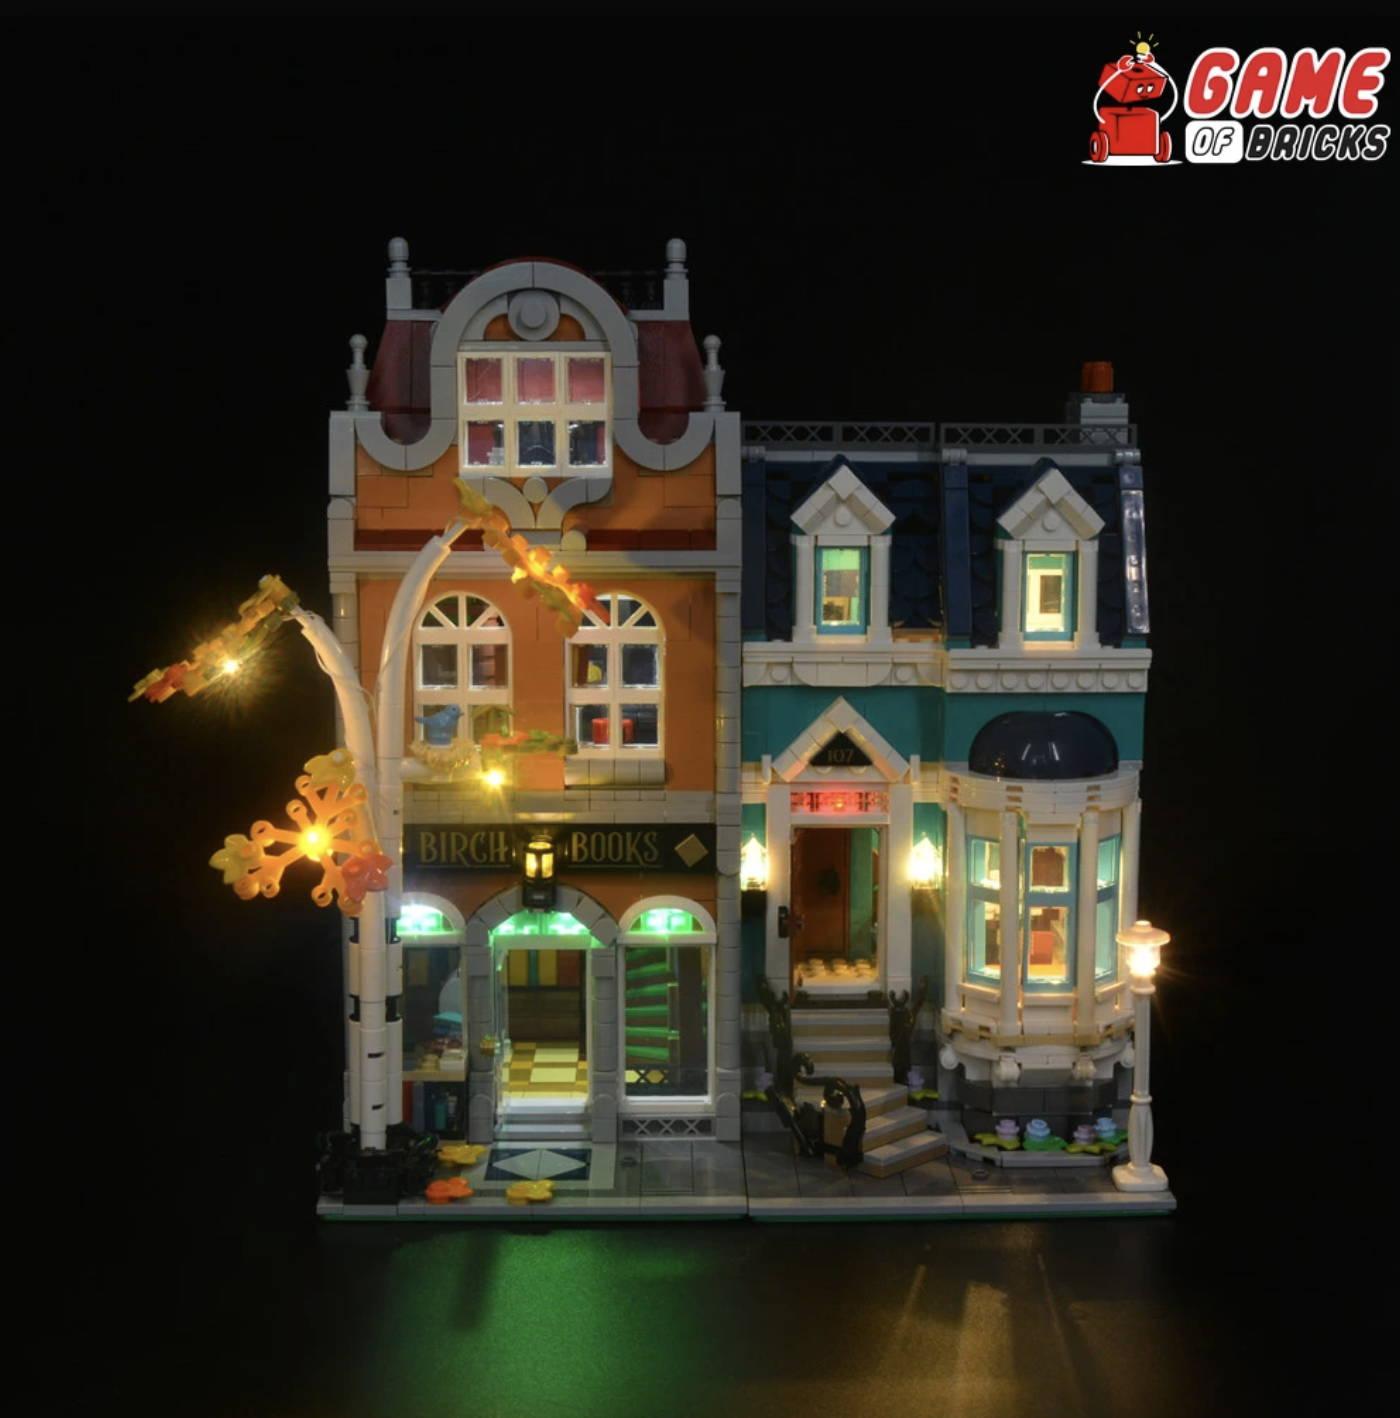 lego bookshop 10270 LEGO Lights